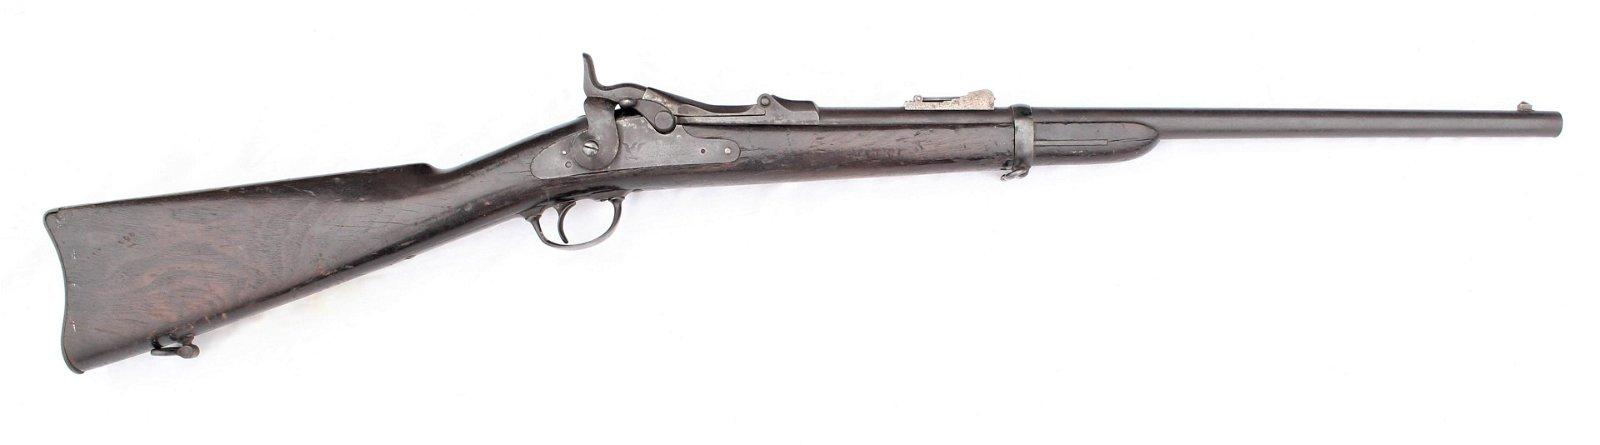 Springfield Trapdoor Carbine